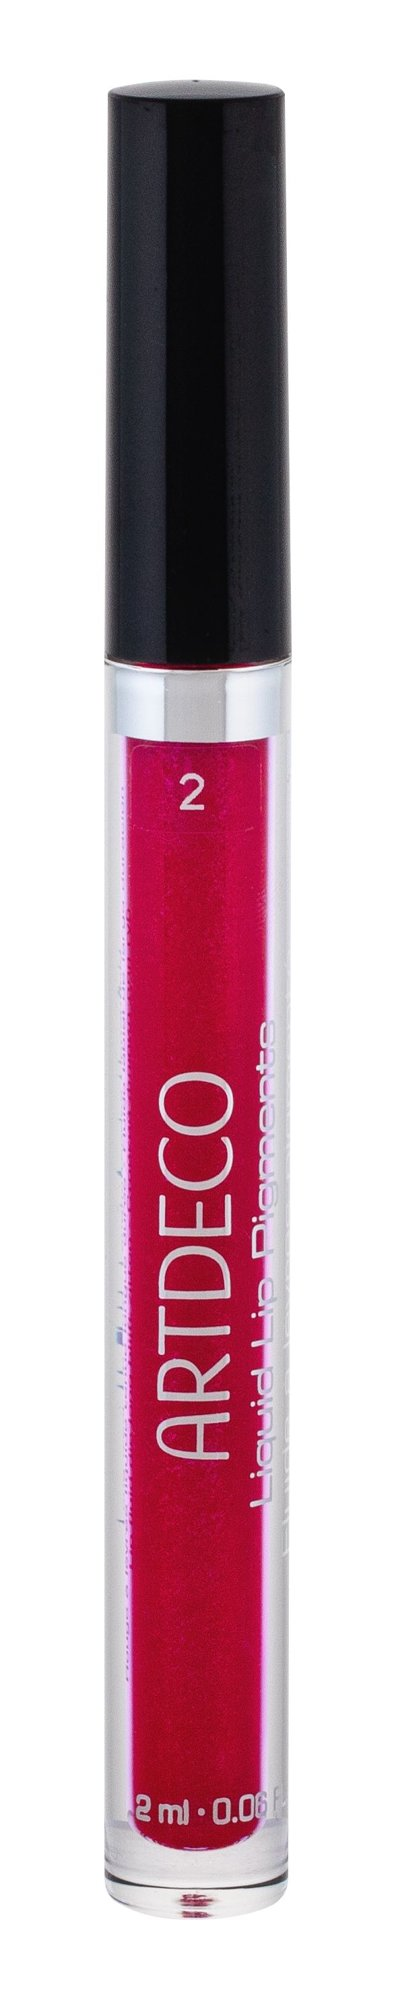 Artdeco Liquid Lip Pigments Lip Gloss 2ml 2 Galactic Love